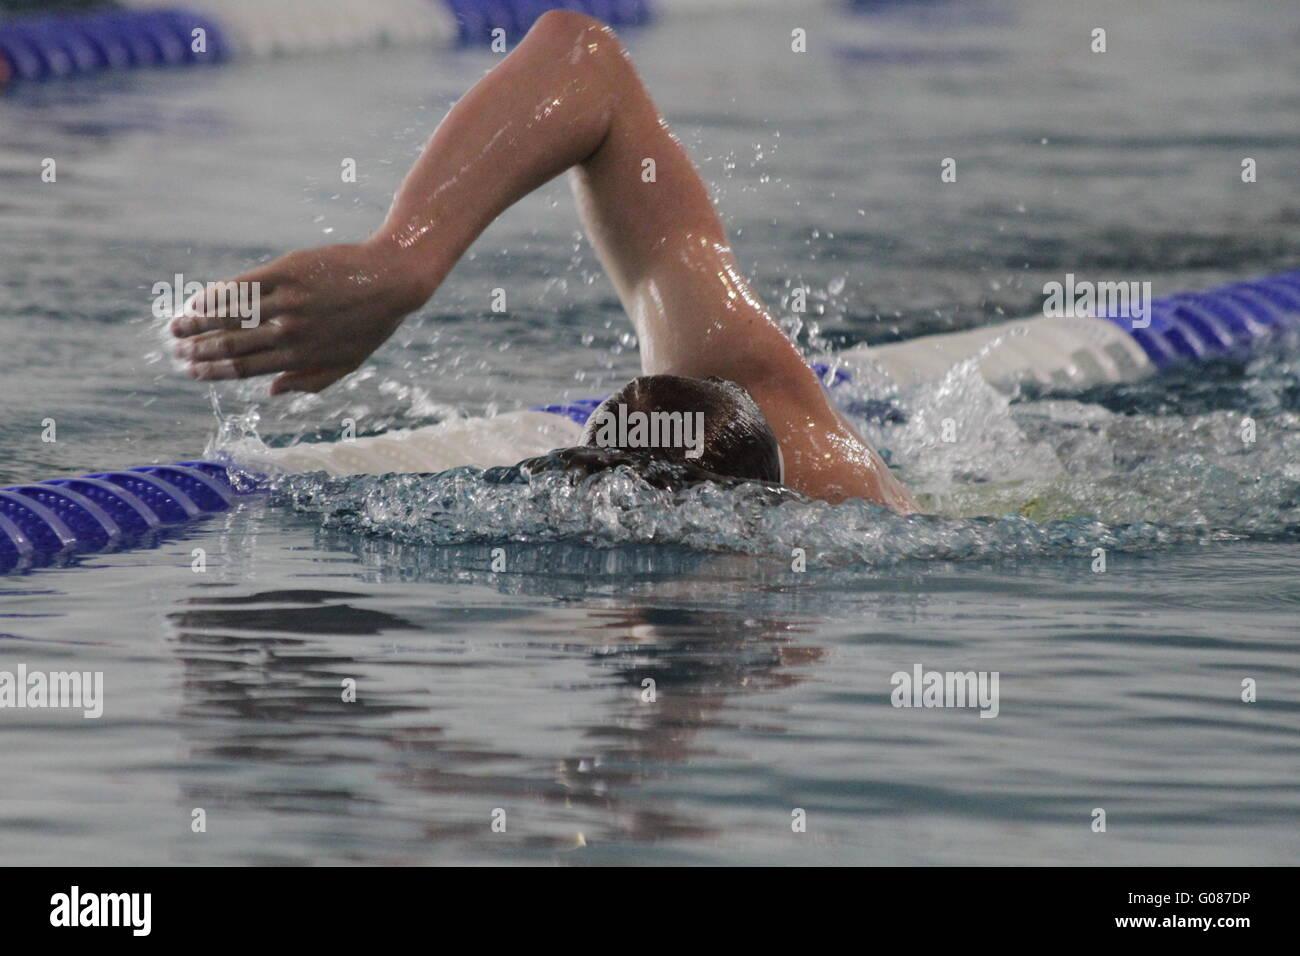 Freestyle swimming - Stock Image